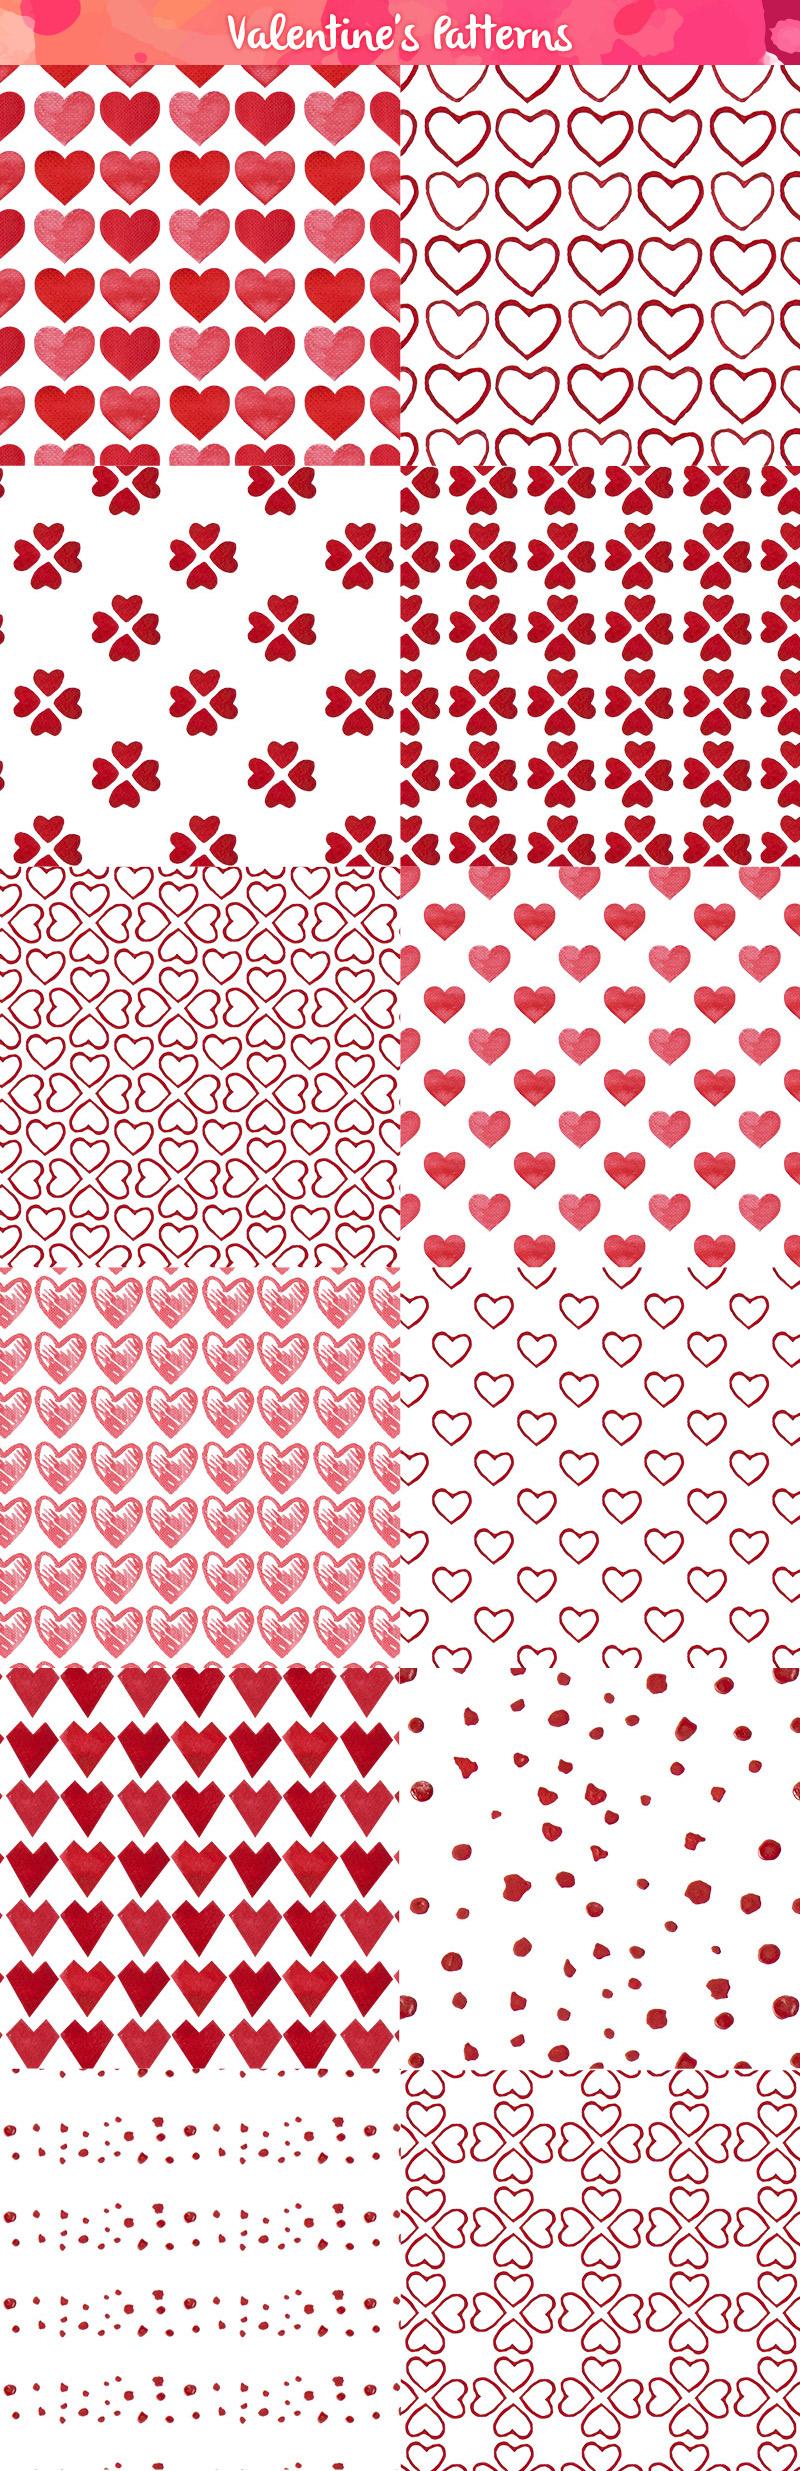 The Lovely Valentines Bundle 16